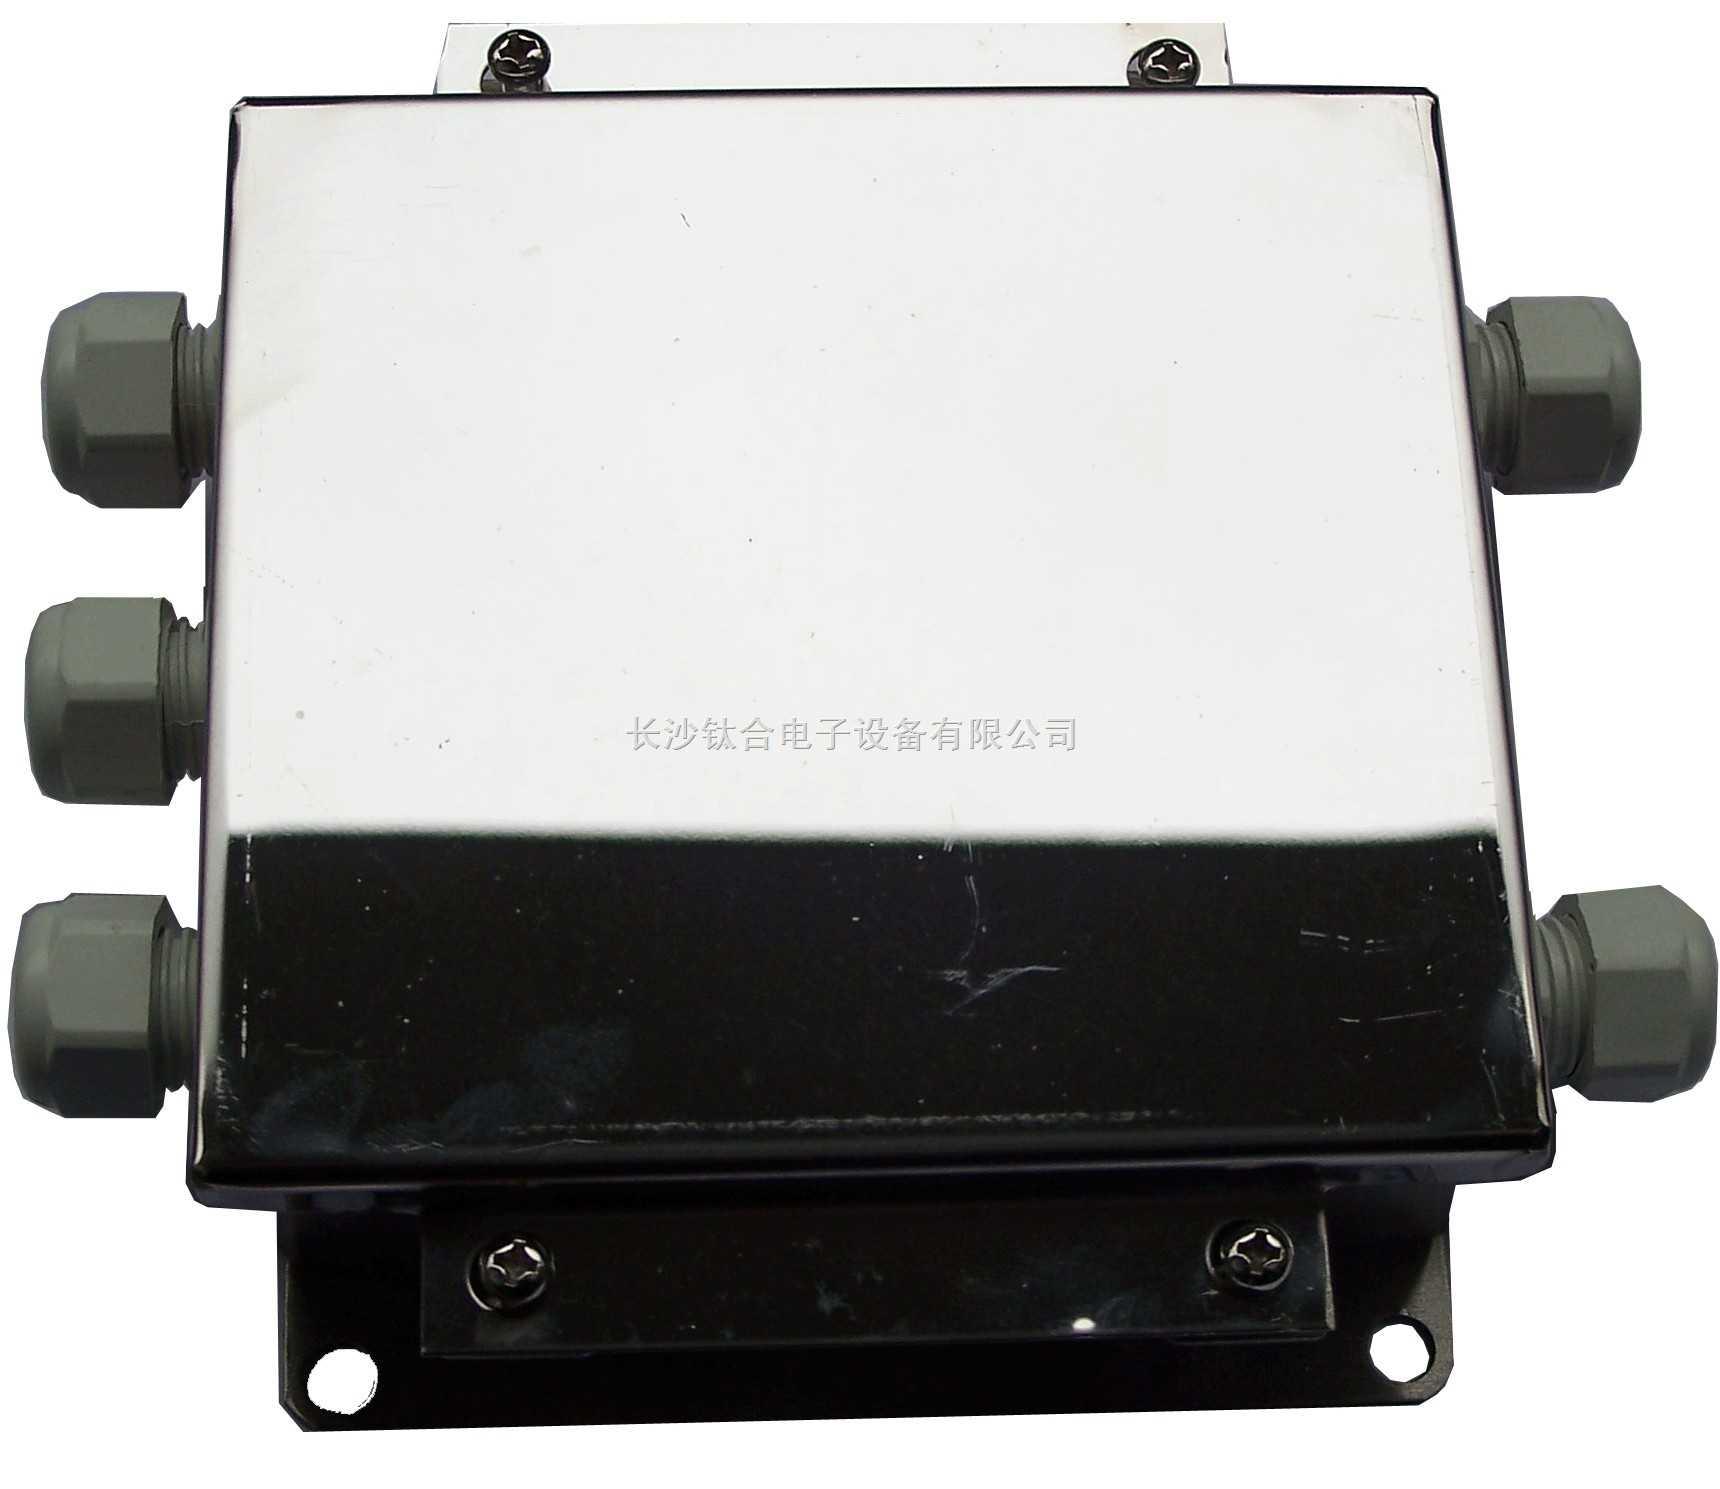 ppm-kl22-4不锈钢防水接线盒